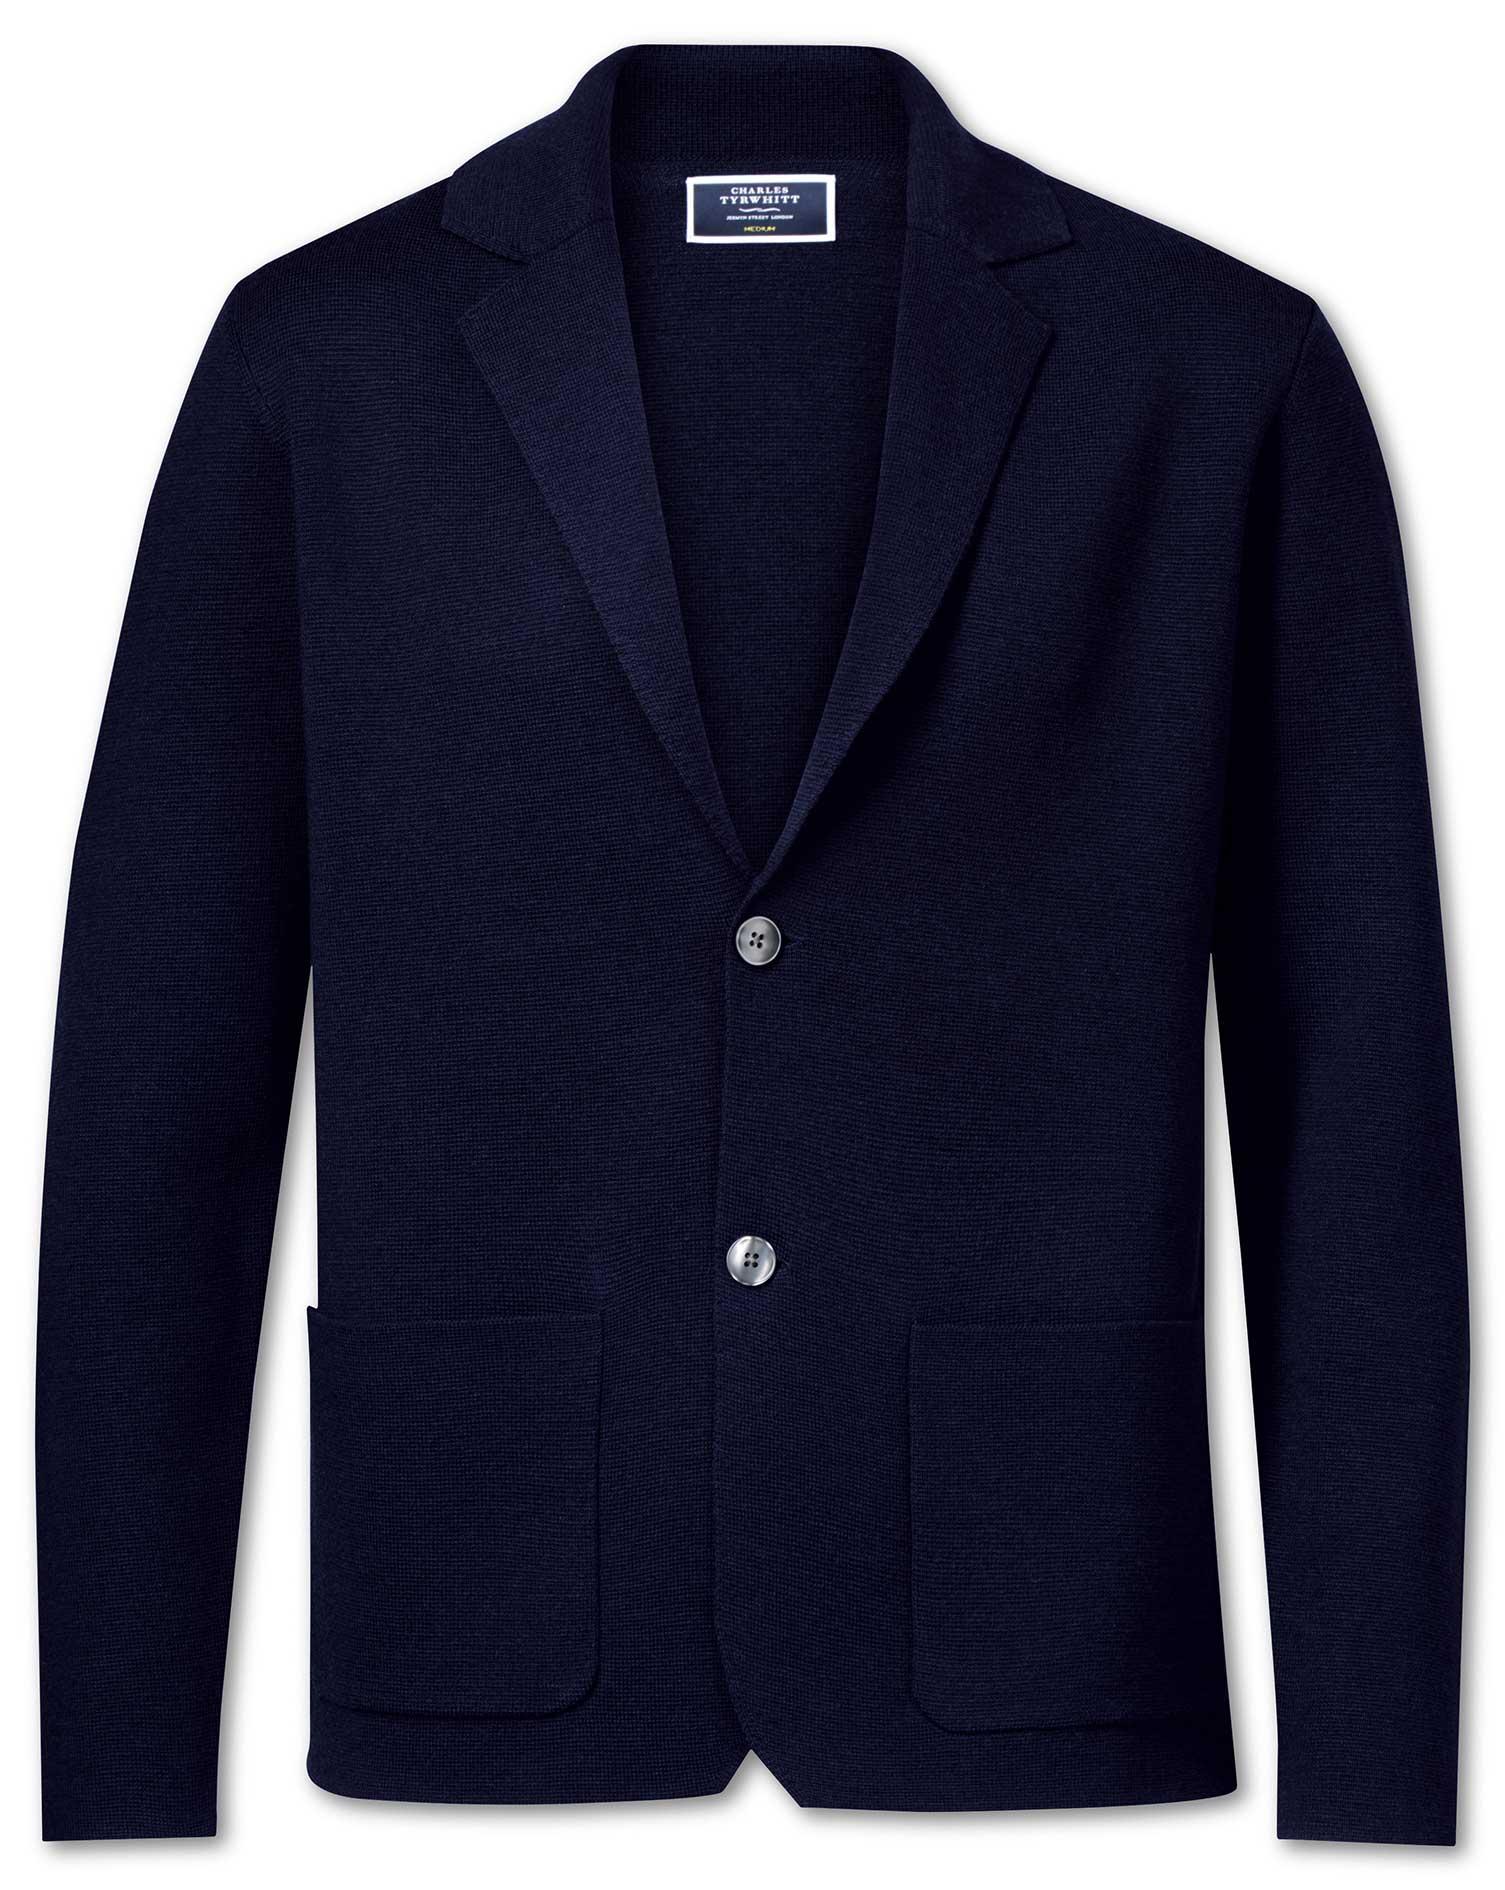 Navy Merino Wool Blazer Size XXXL by Charles Tyrwhitt